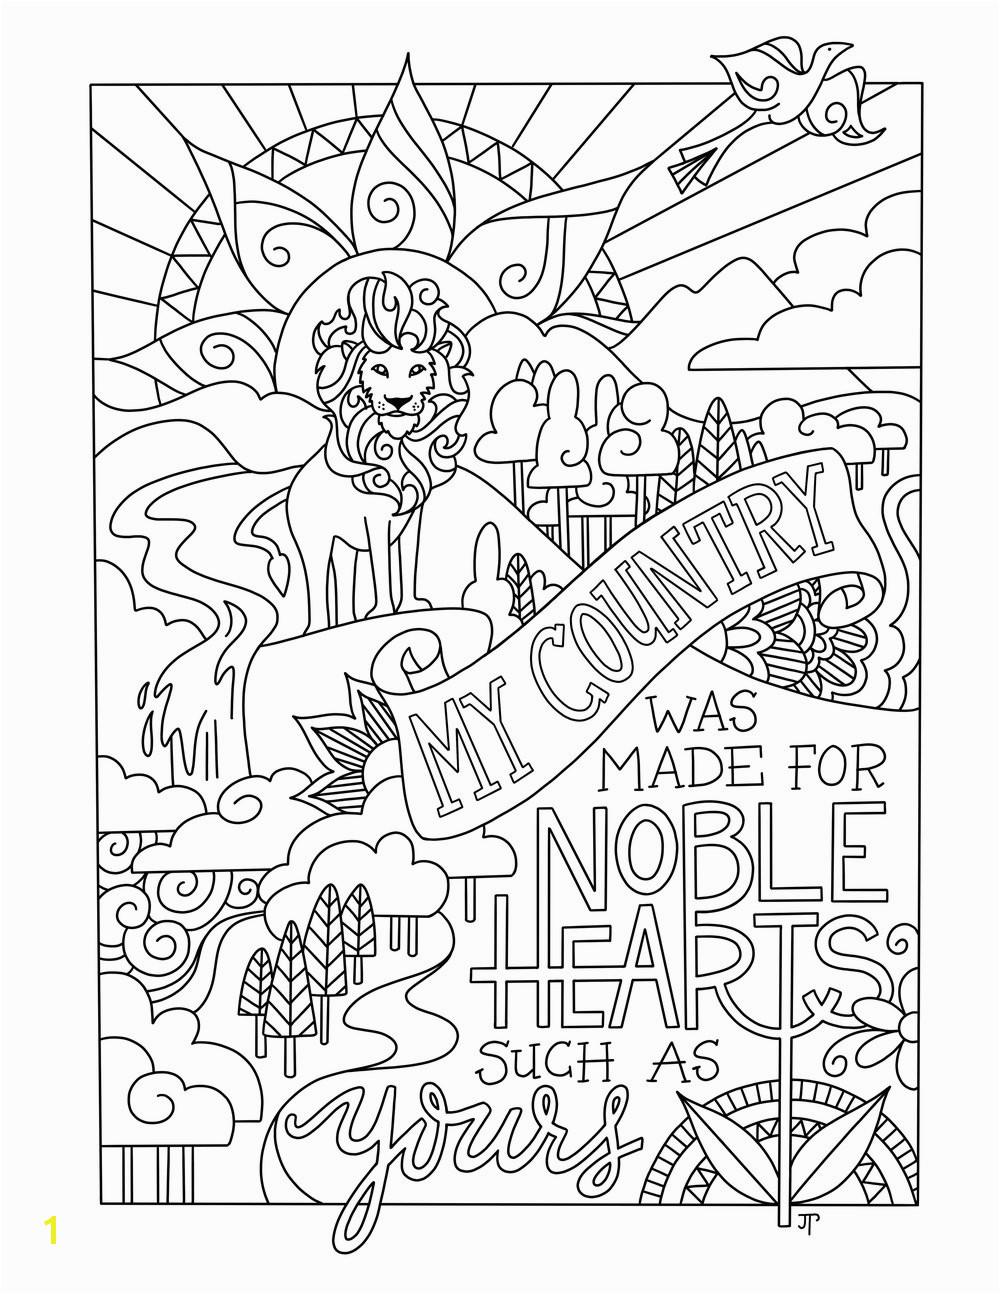 Narnia coloring page